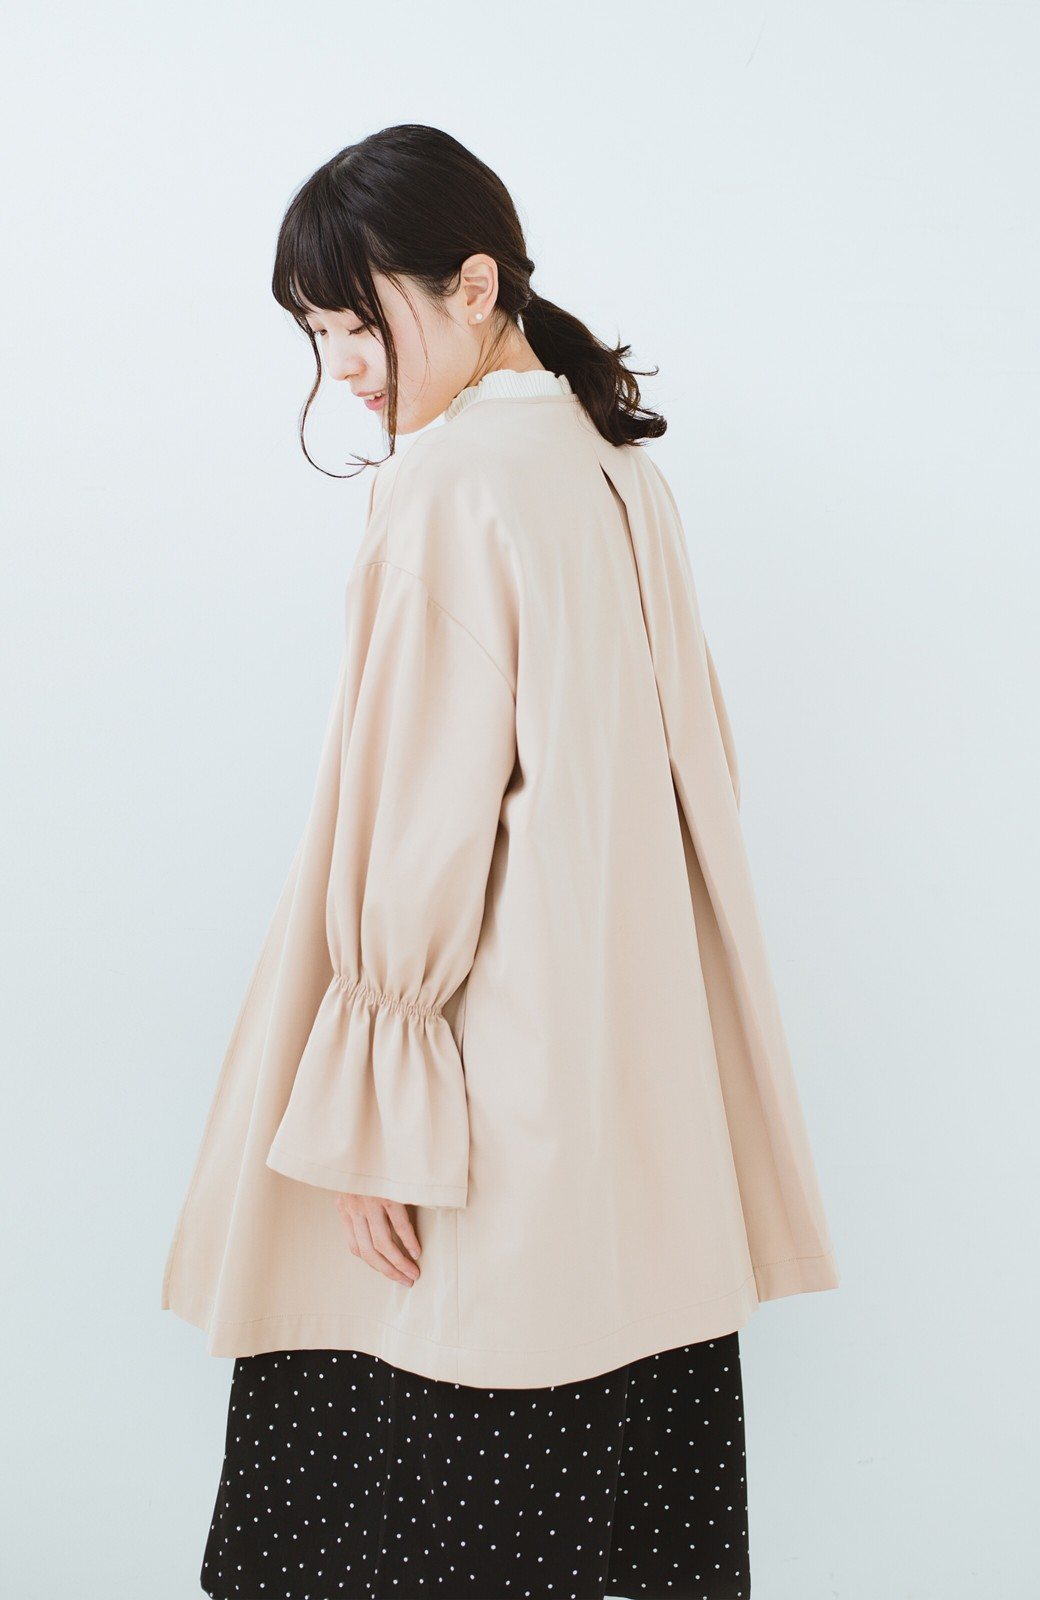 haco! ただ羽織るだけでオシャレに見える 気軽なフレアースリーブコート <ベージュ>の商品写真13